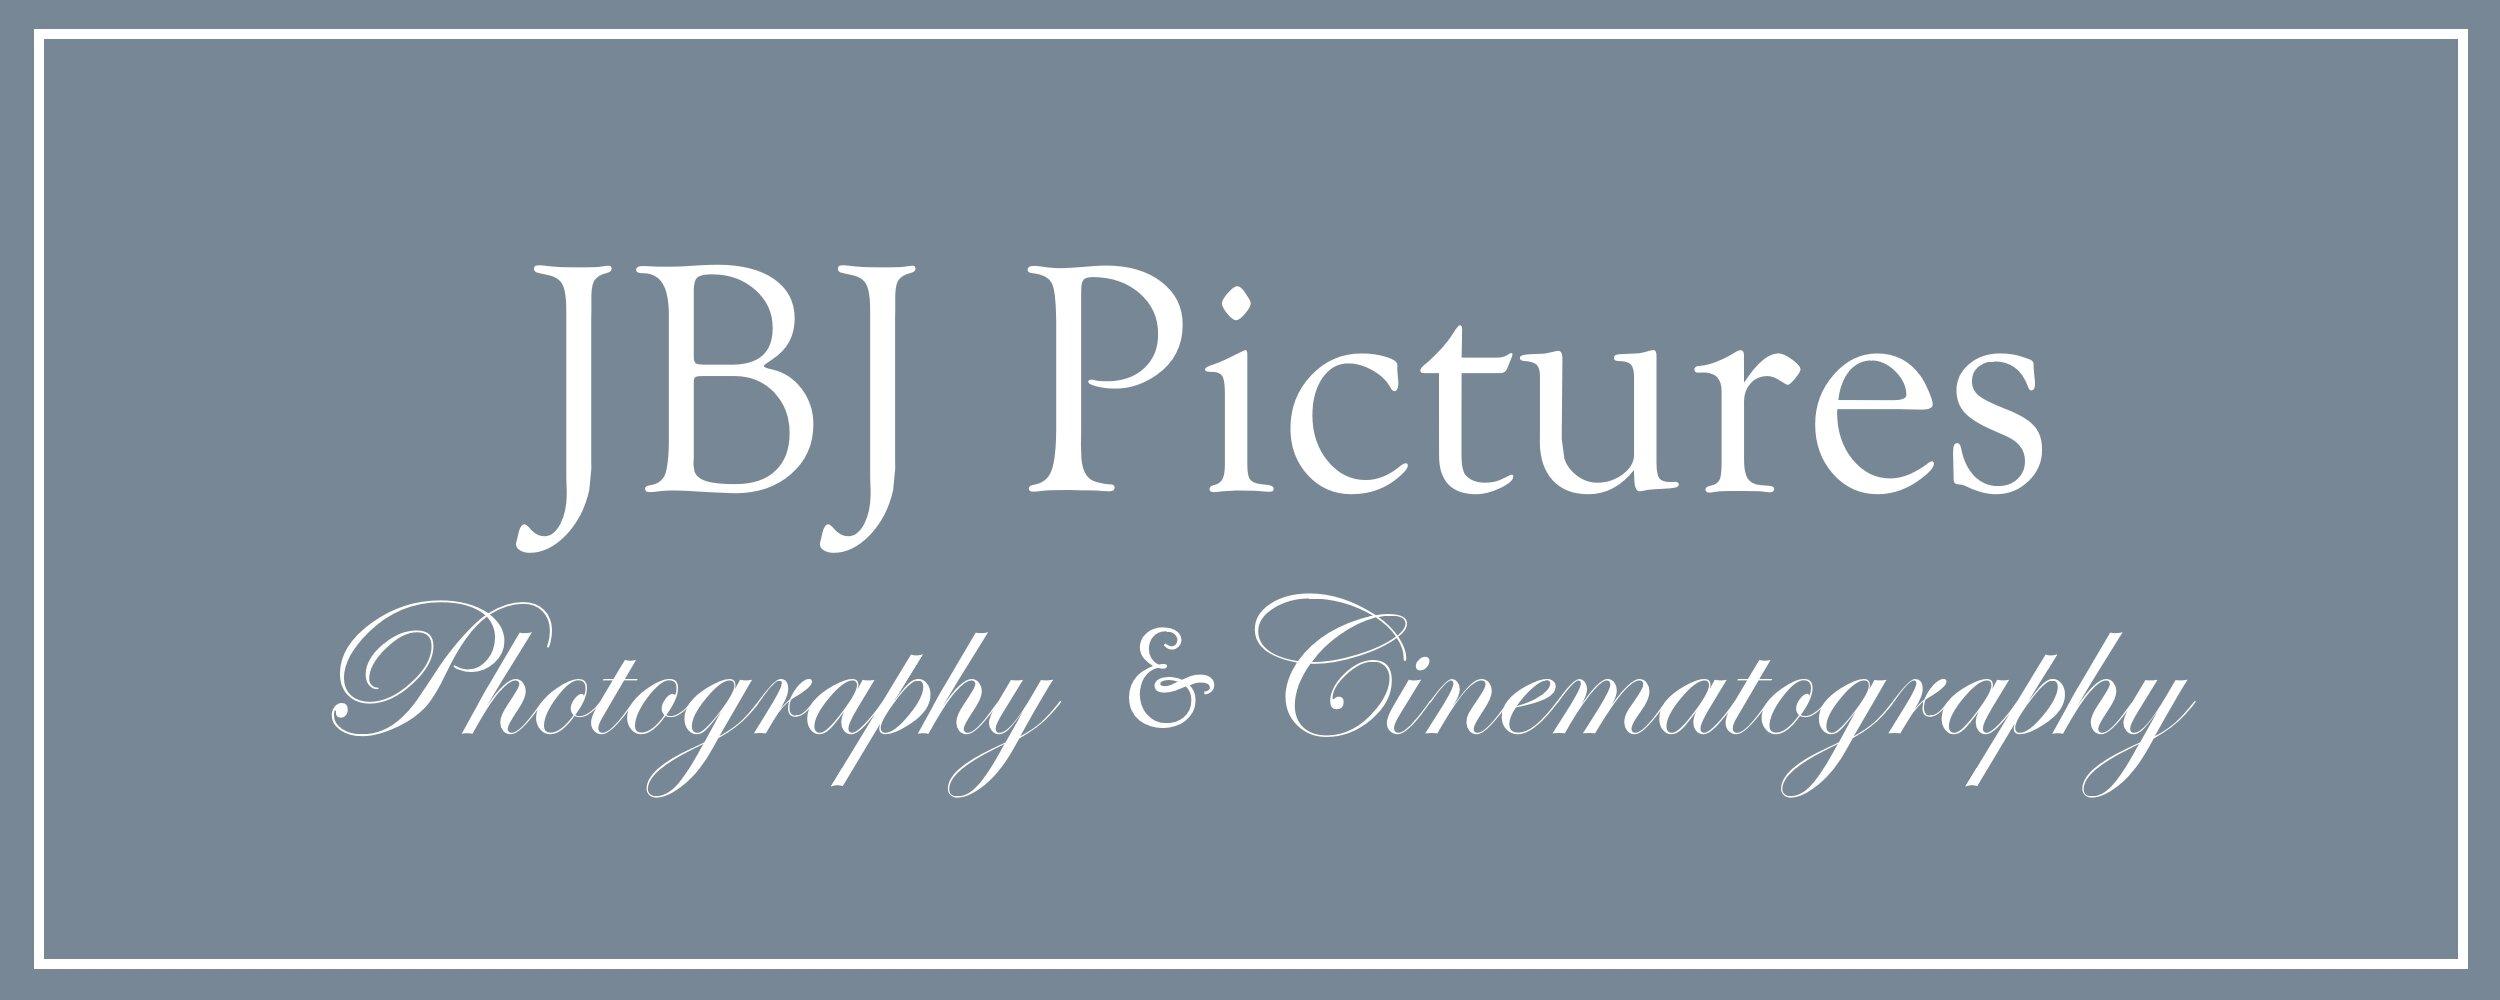 JBJ Pictures Logo - NEW 3 White  Text - Grey Background.jpg